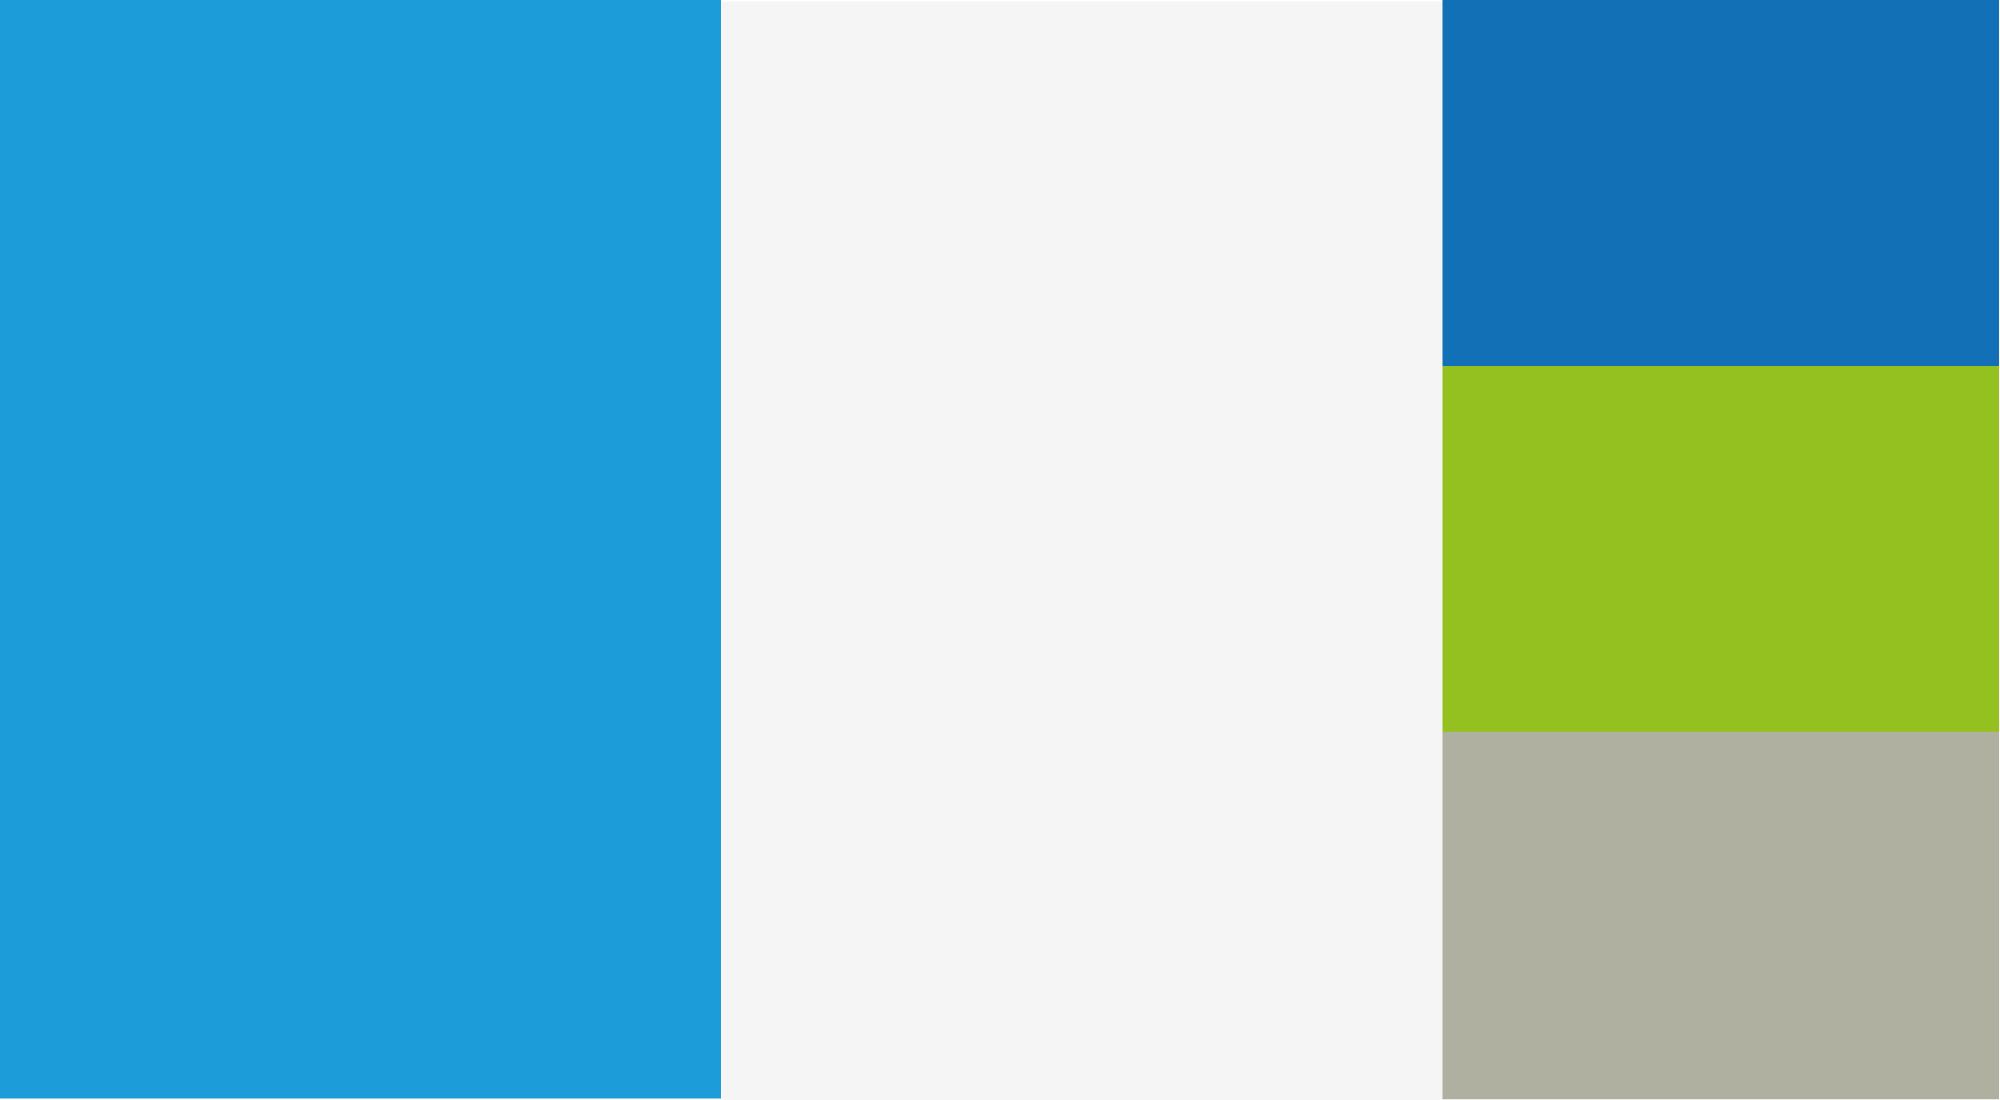 Cardiosalus-branding-colors